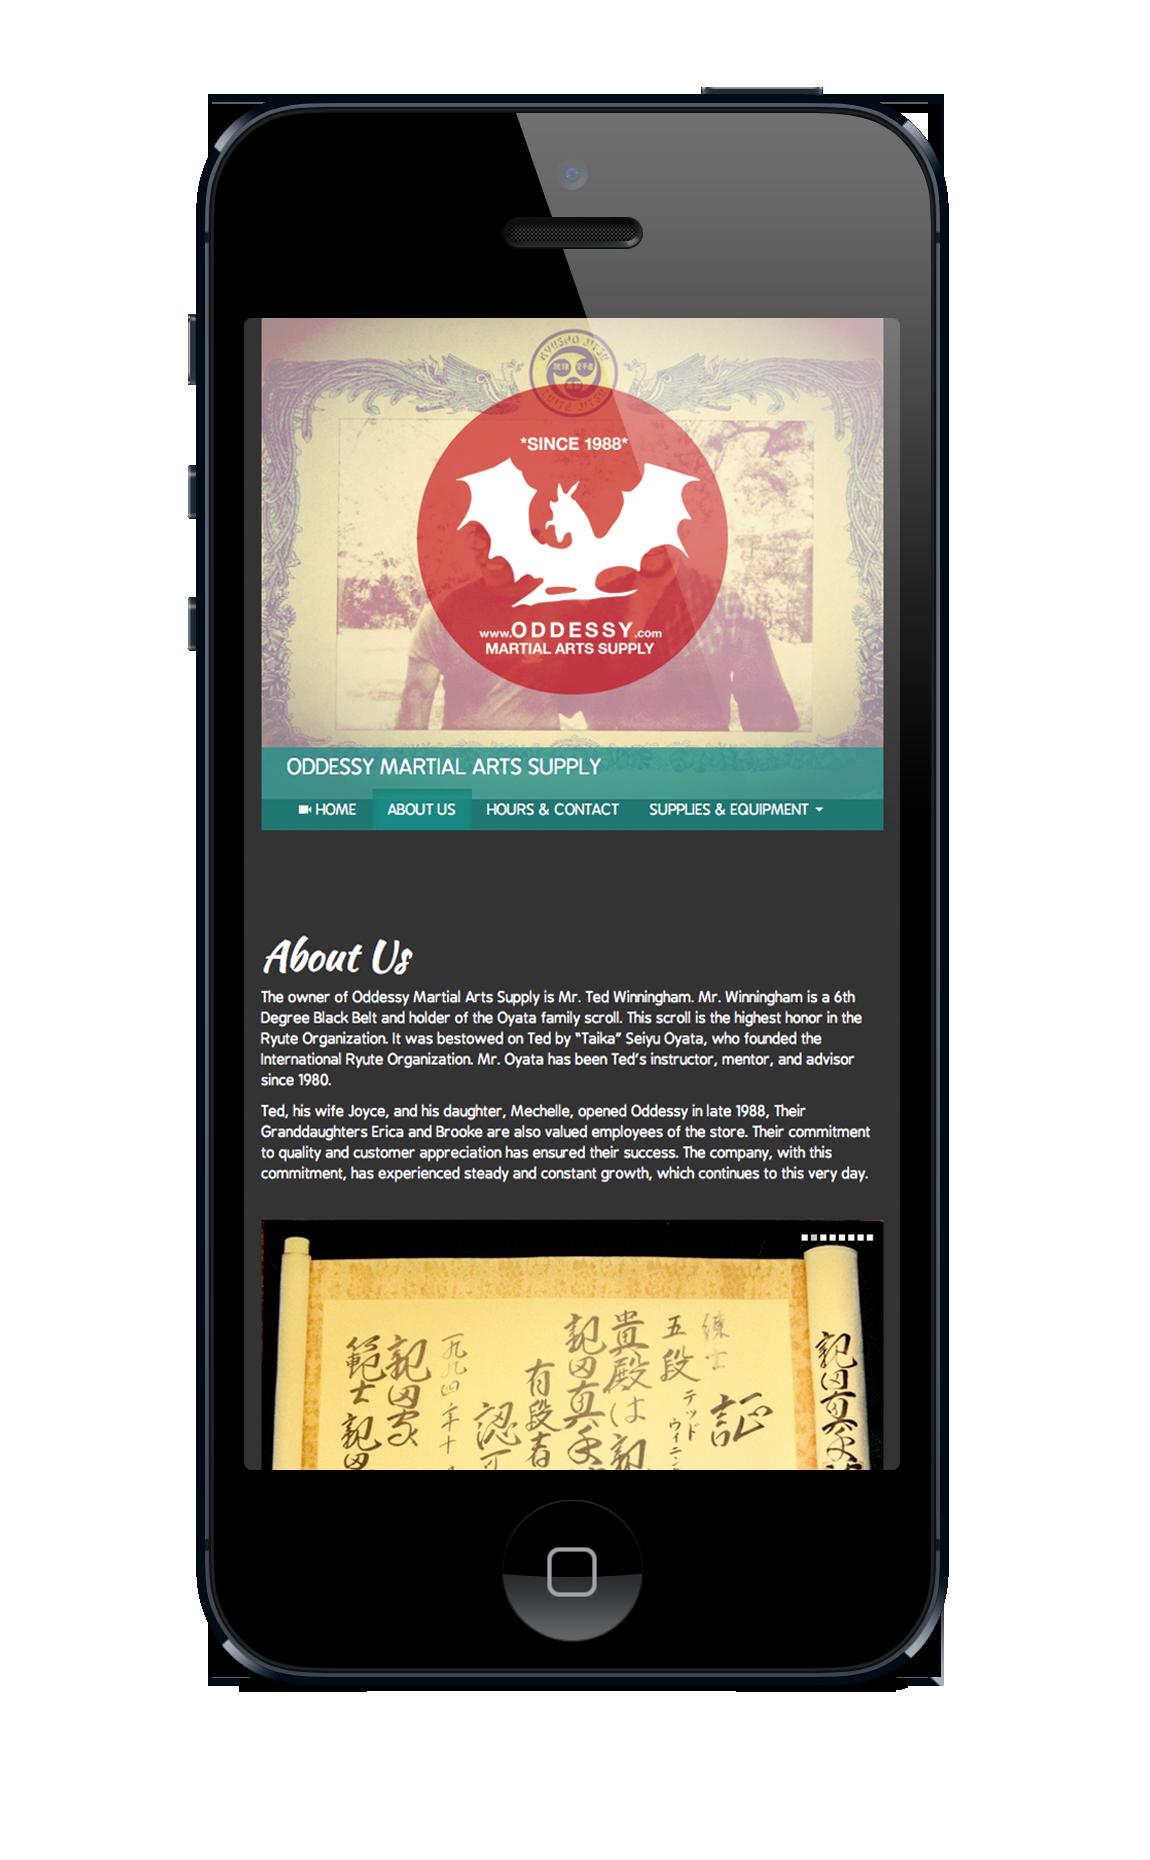 Oddessy Martial Arts supply kansas city Website Responsive